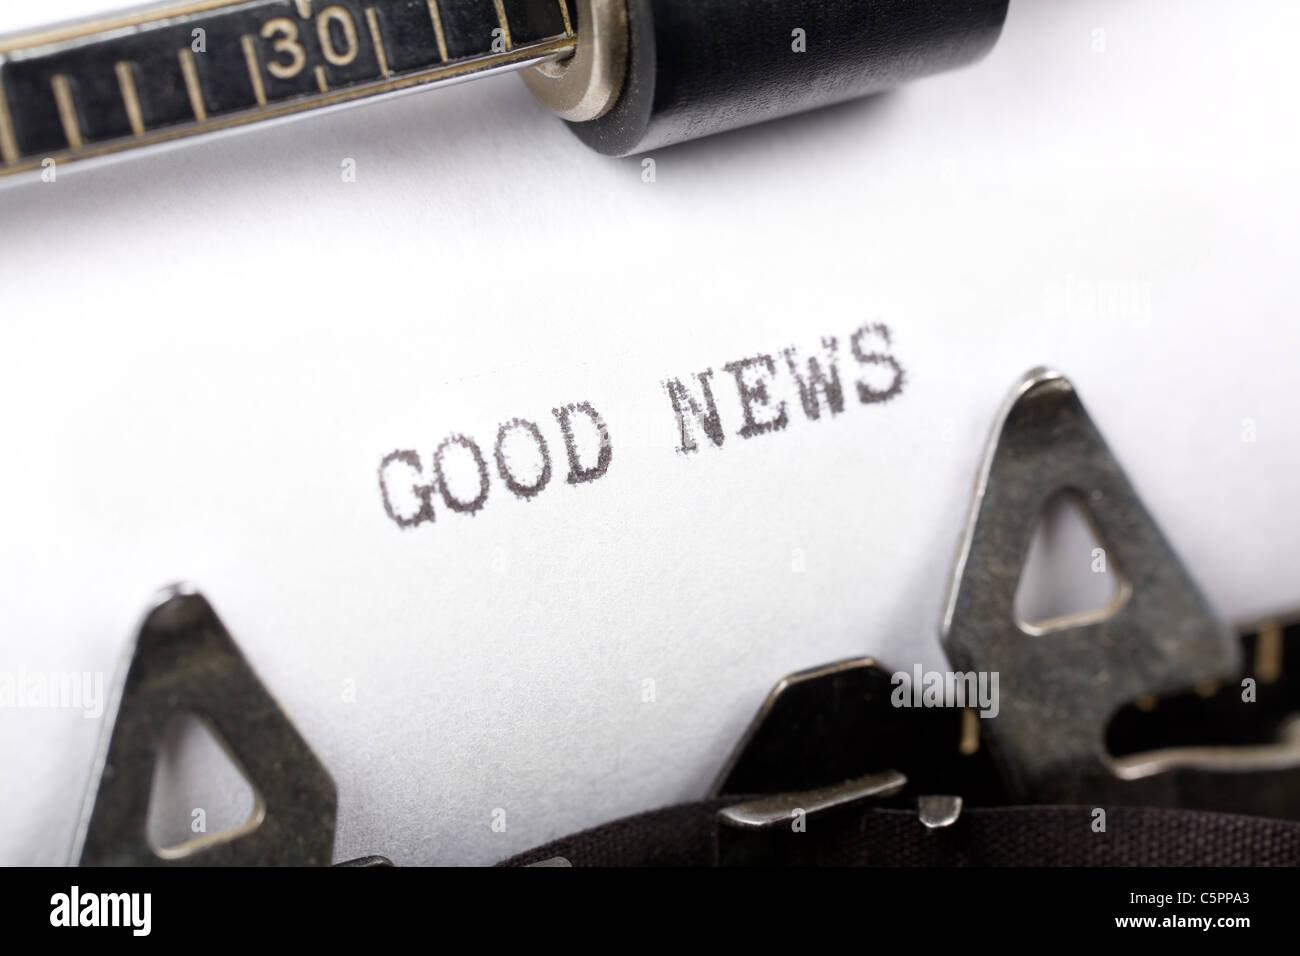 Typewriter close up shot, concept of Good News - Stock Image